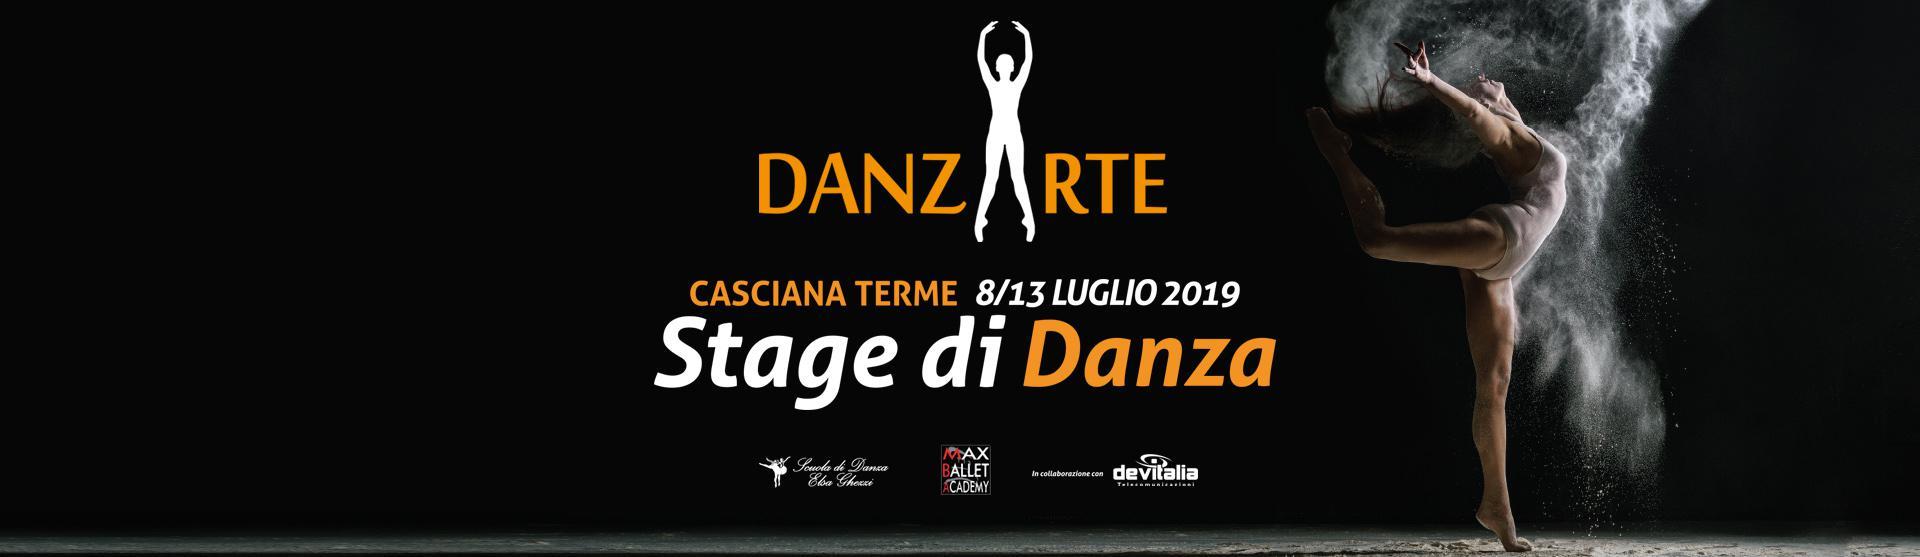 DanzArte Casciana Terme 2019